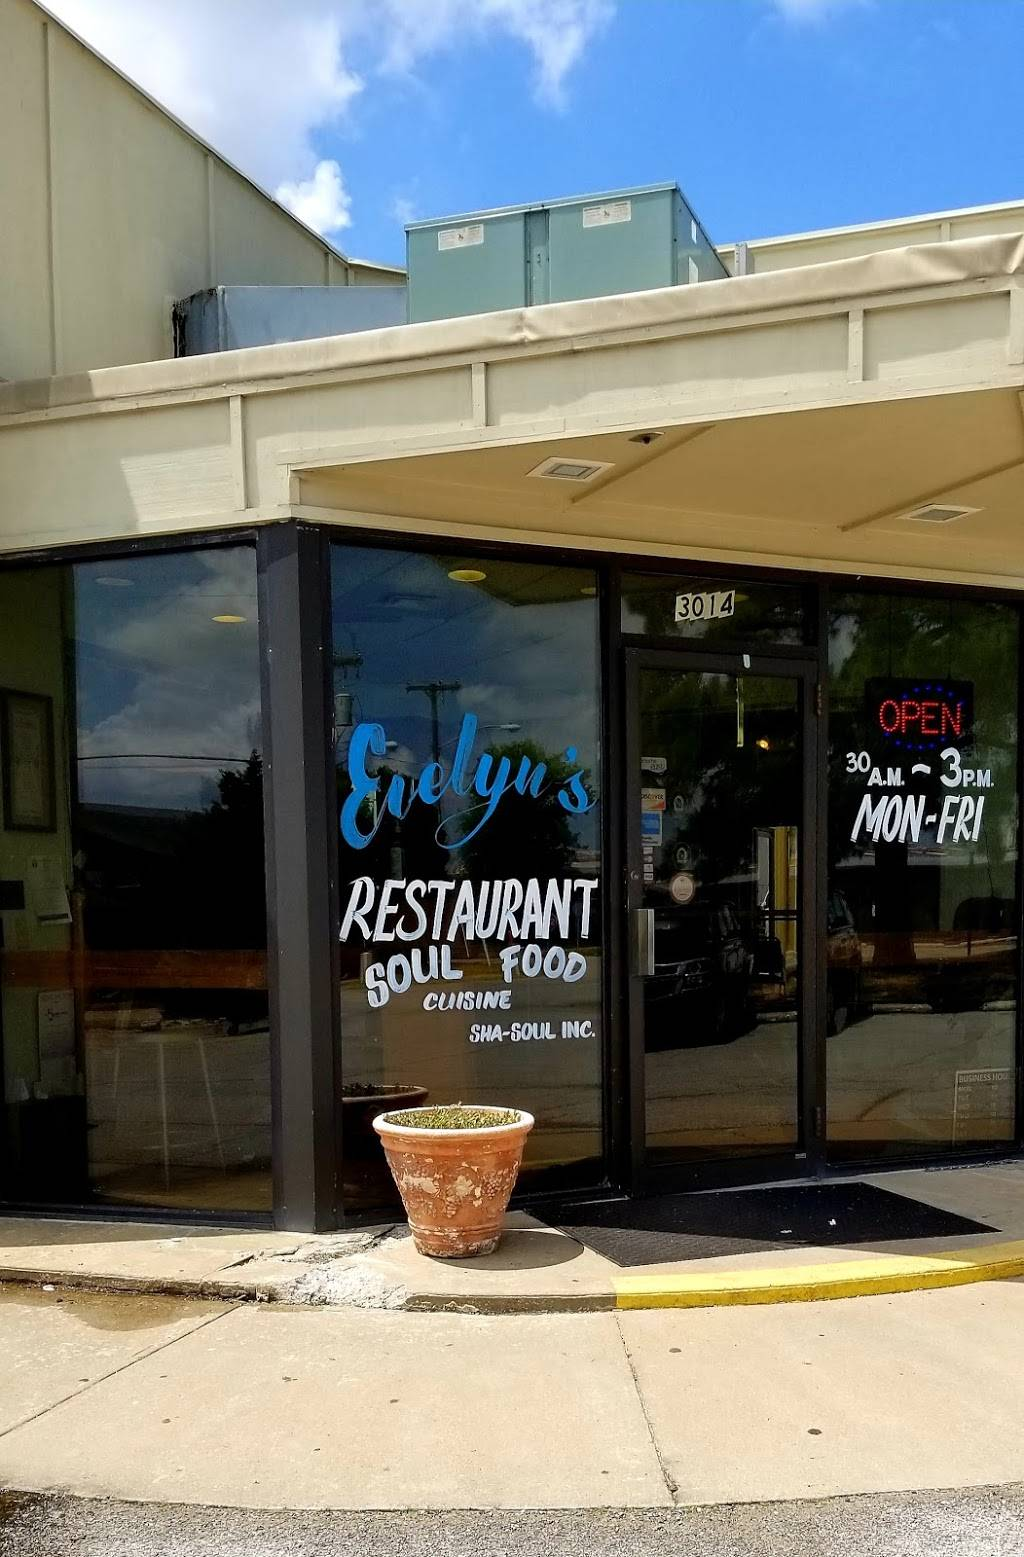 Evelyns - restaurant  | Photo 3 of 8 | Address: 3014 N 74th E Ave, Tulsa, OK 74115, USA | Phone: (918) 835-1212